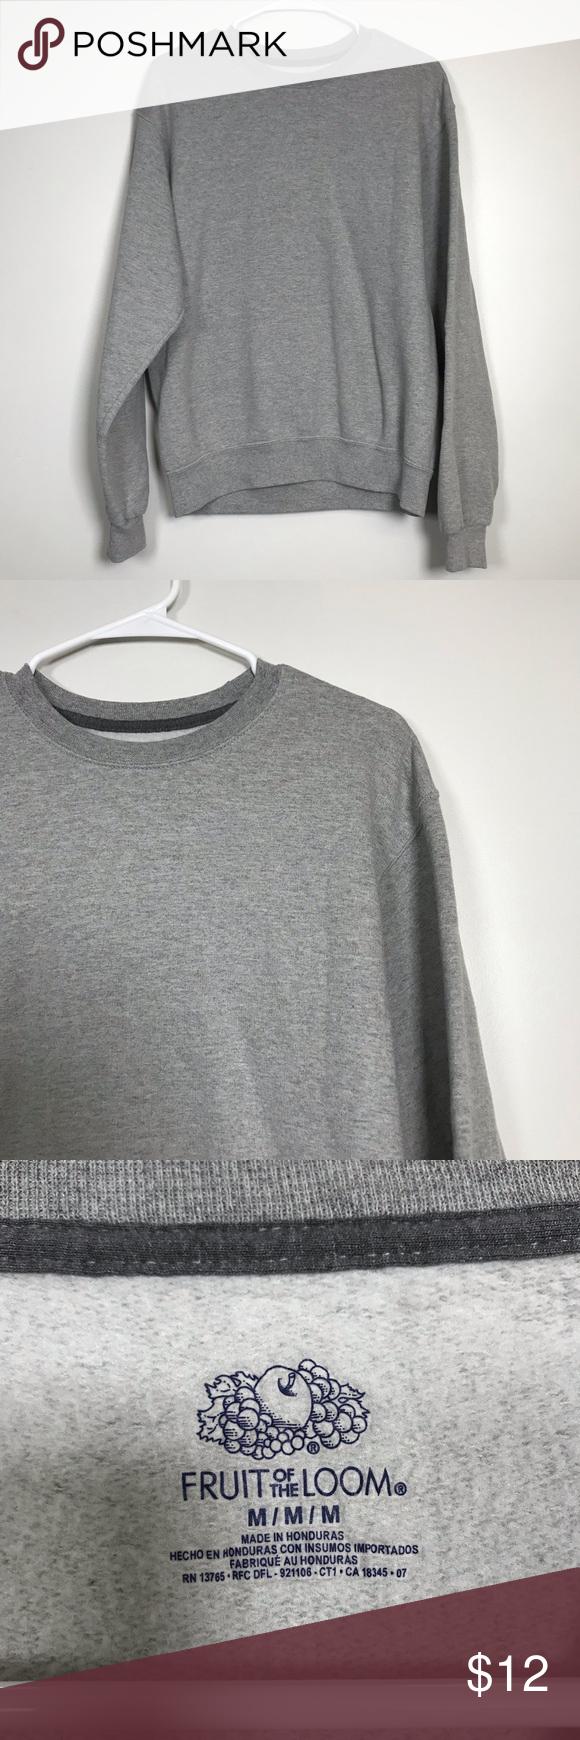 Sweat | Fruit Of The Loom Sweatshirt | EMP